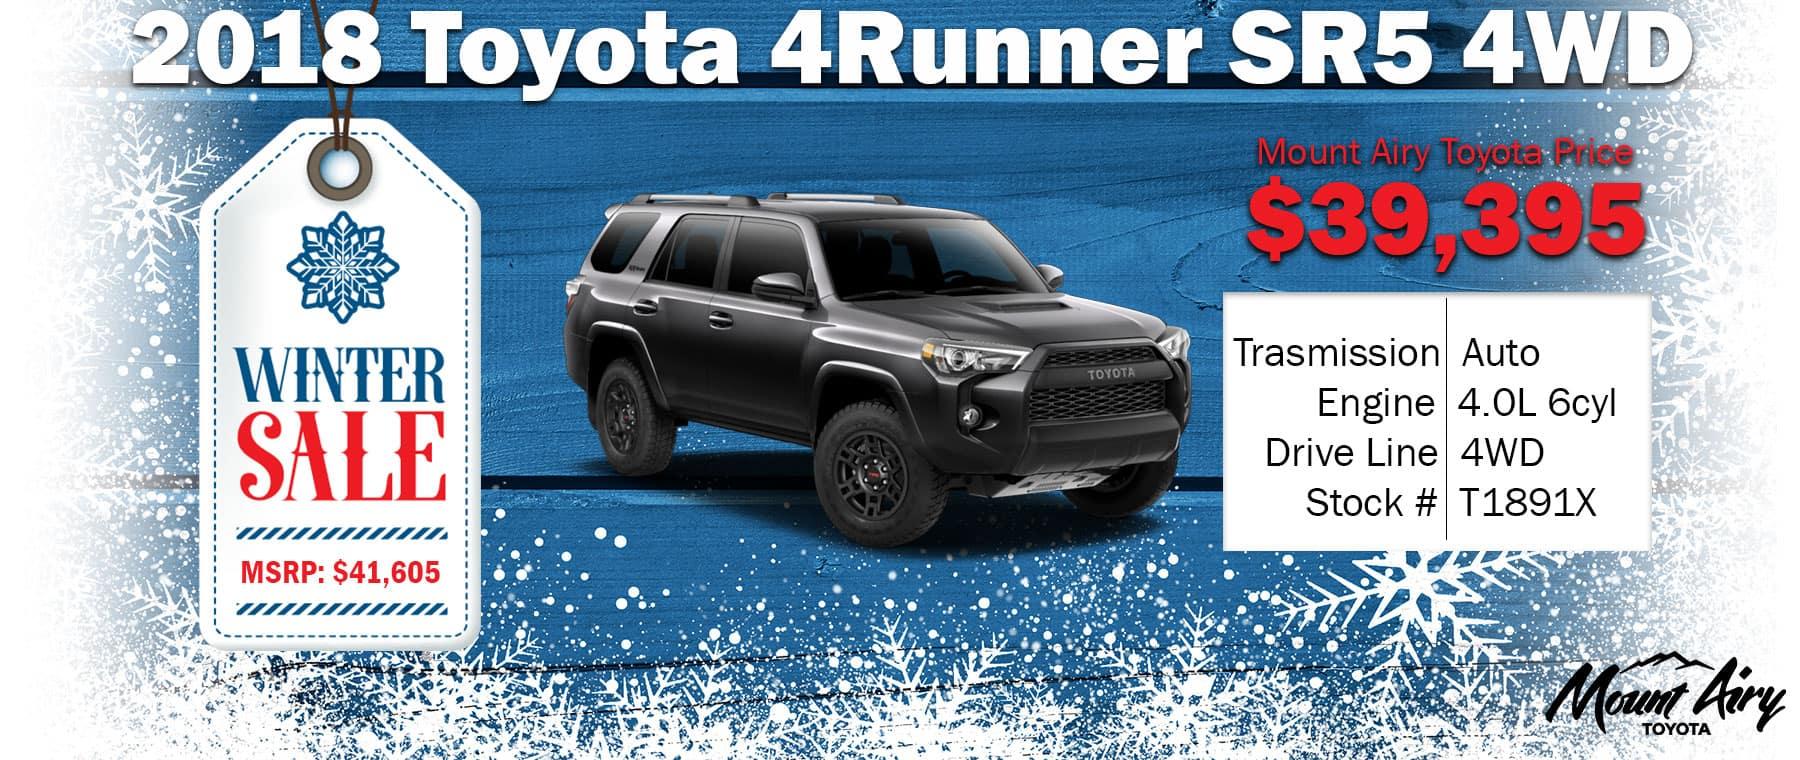 Best Toyota 4Runner in Mount Airy